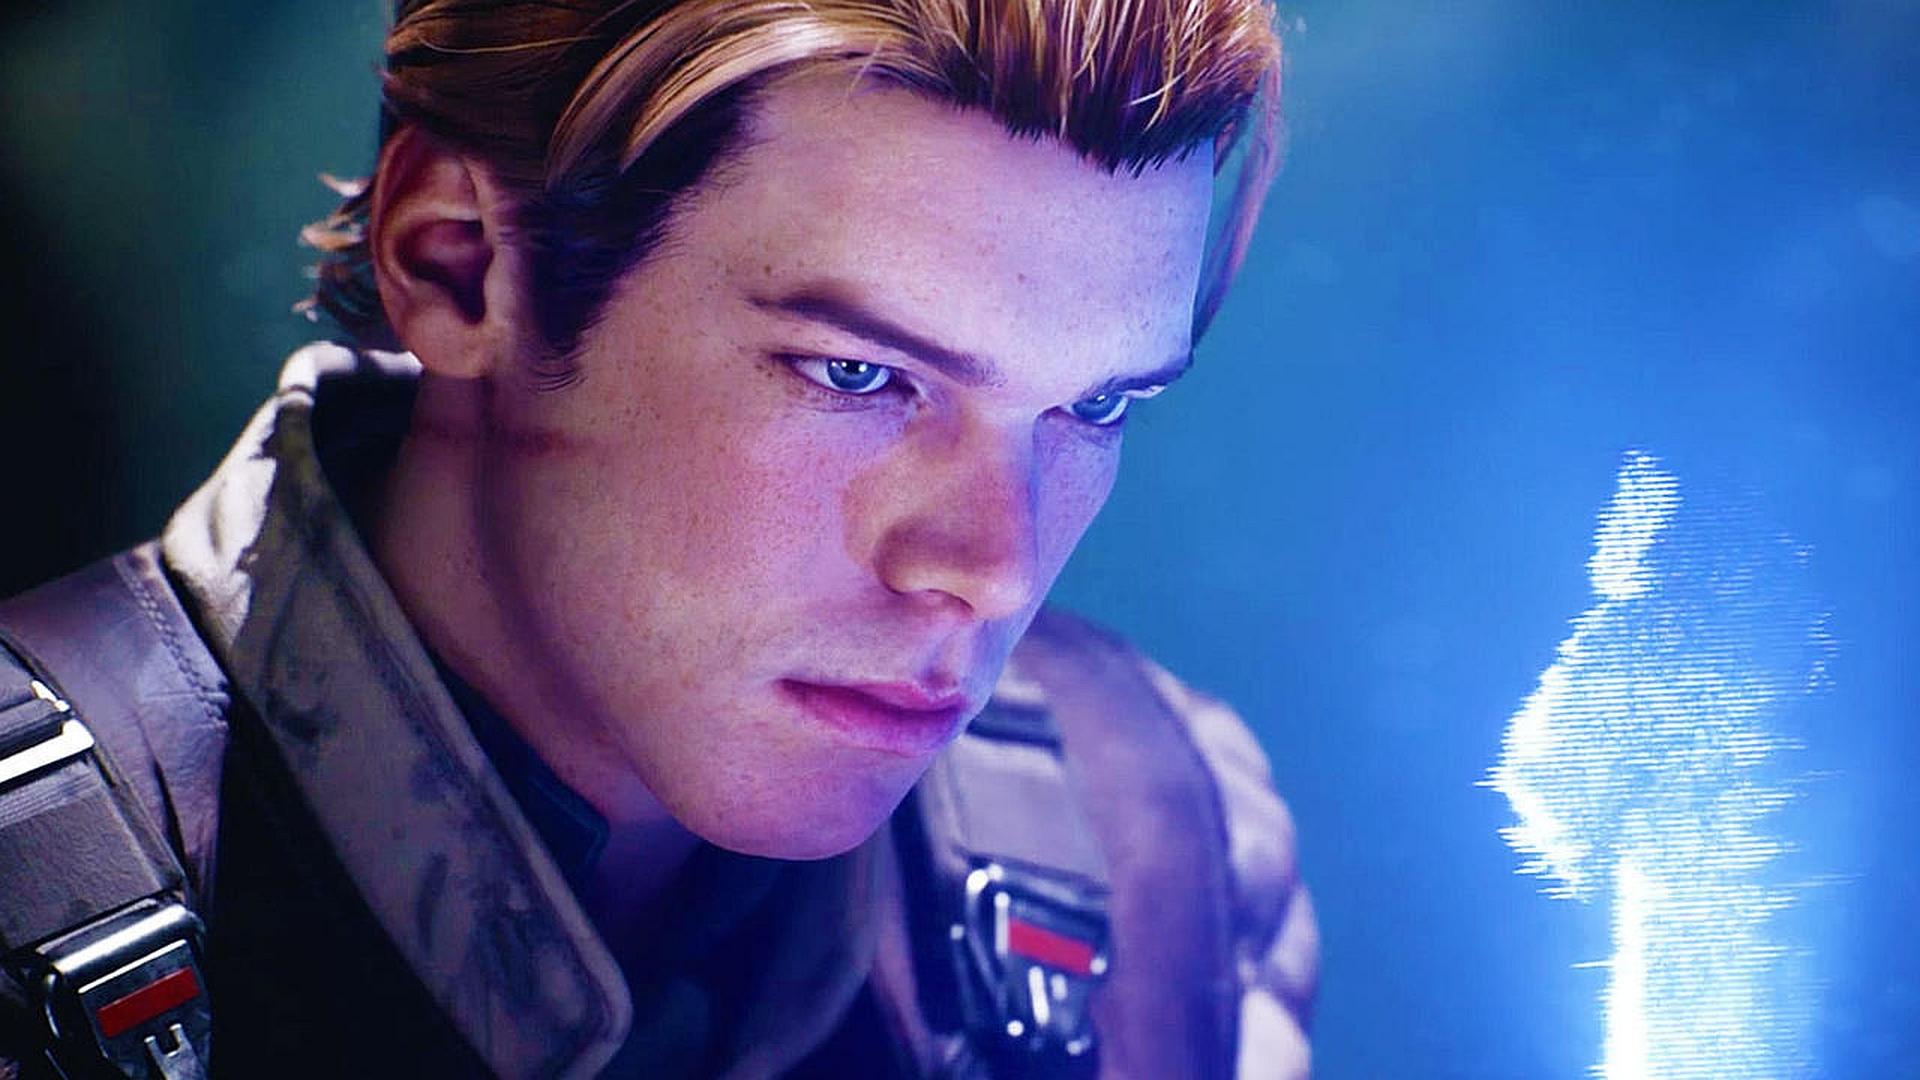 Star Wars Jedi: Fallen Order's lead is male because of Rey screenshot